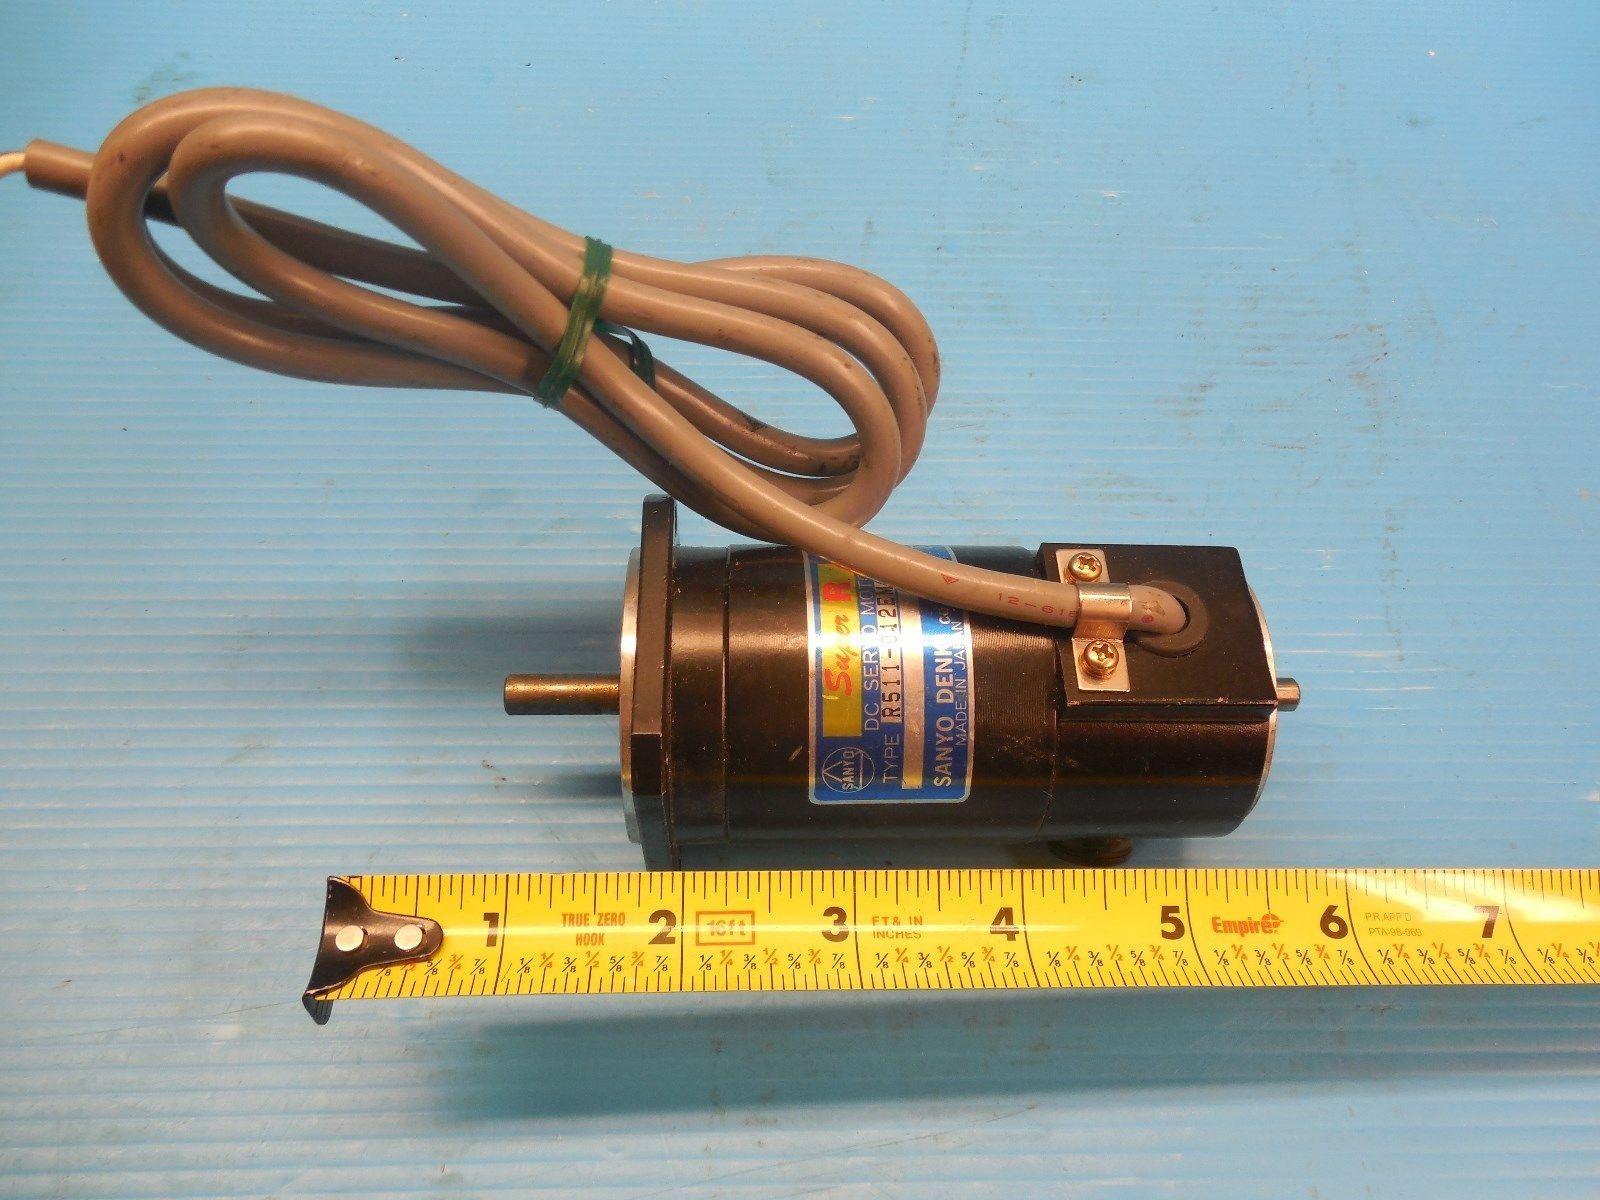 Sanyo Denki R511 012em Dc Servo Motor Industrial Made In Japan L6 30 M J Tooling Llc